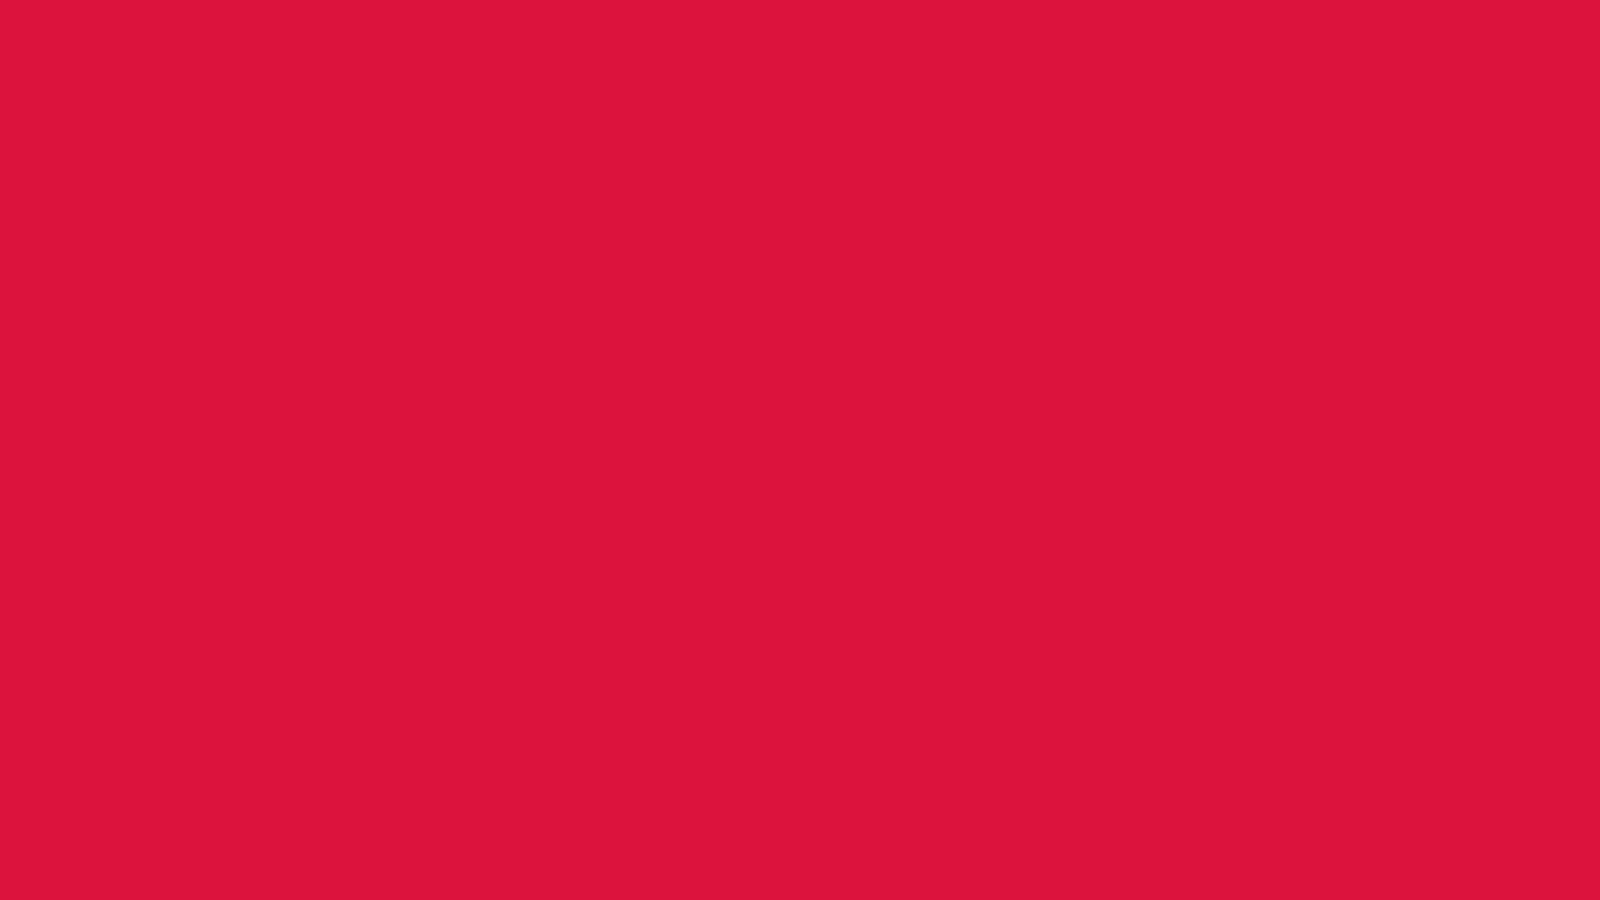 1600x900 Crimson Solid Color Background